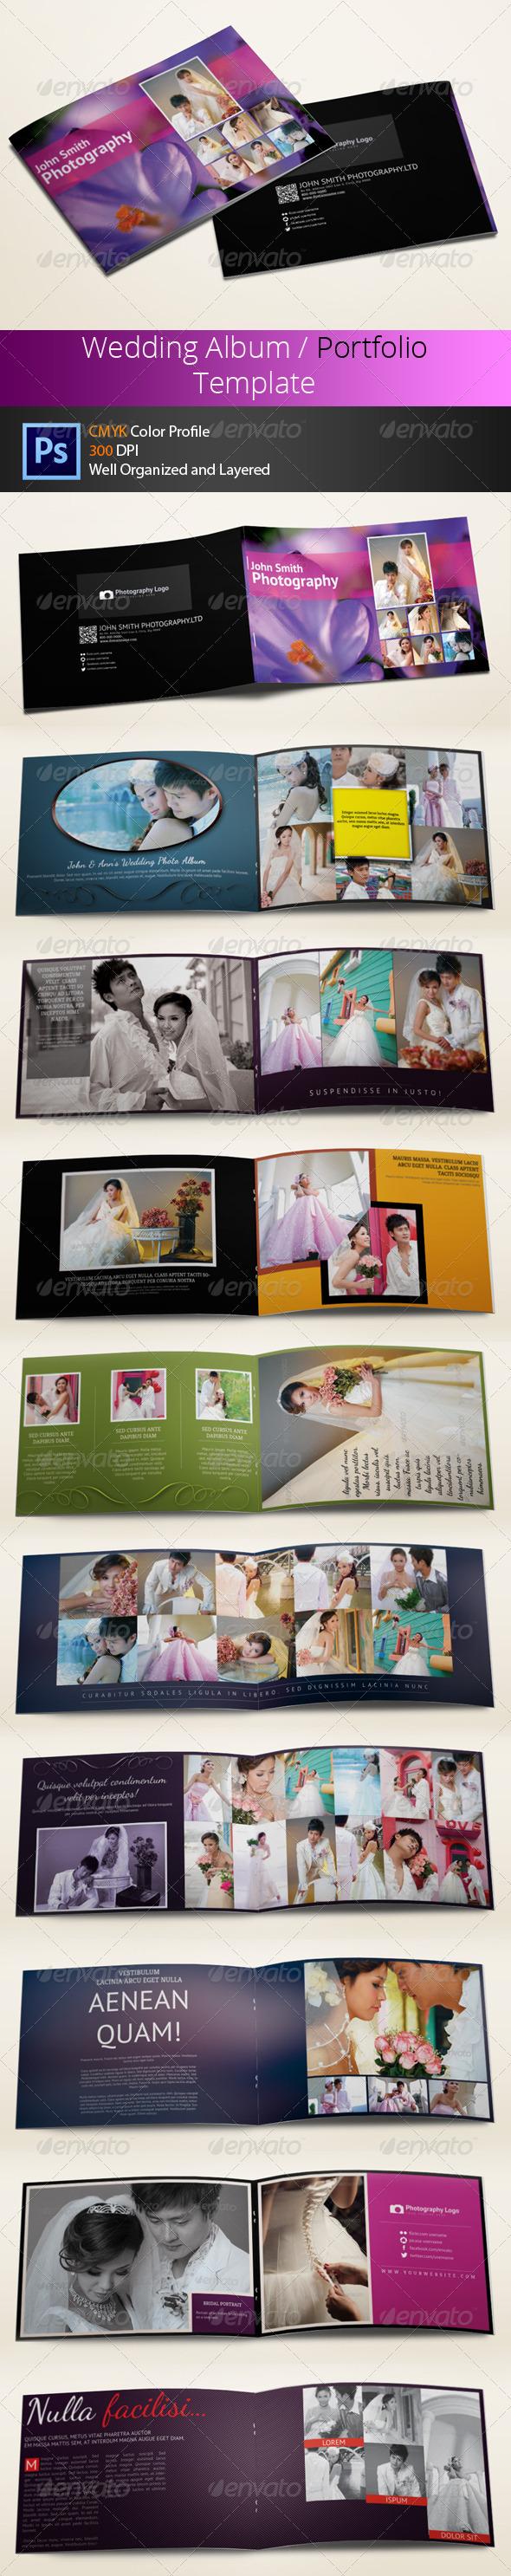 GraphicRiver Wedding Photo Album or Portfolio 6303873